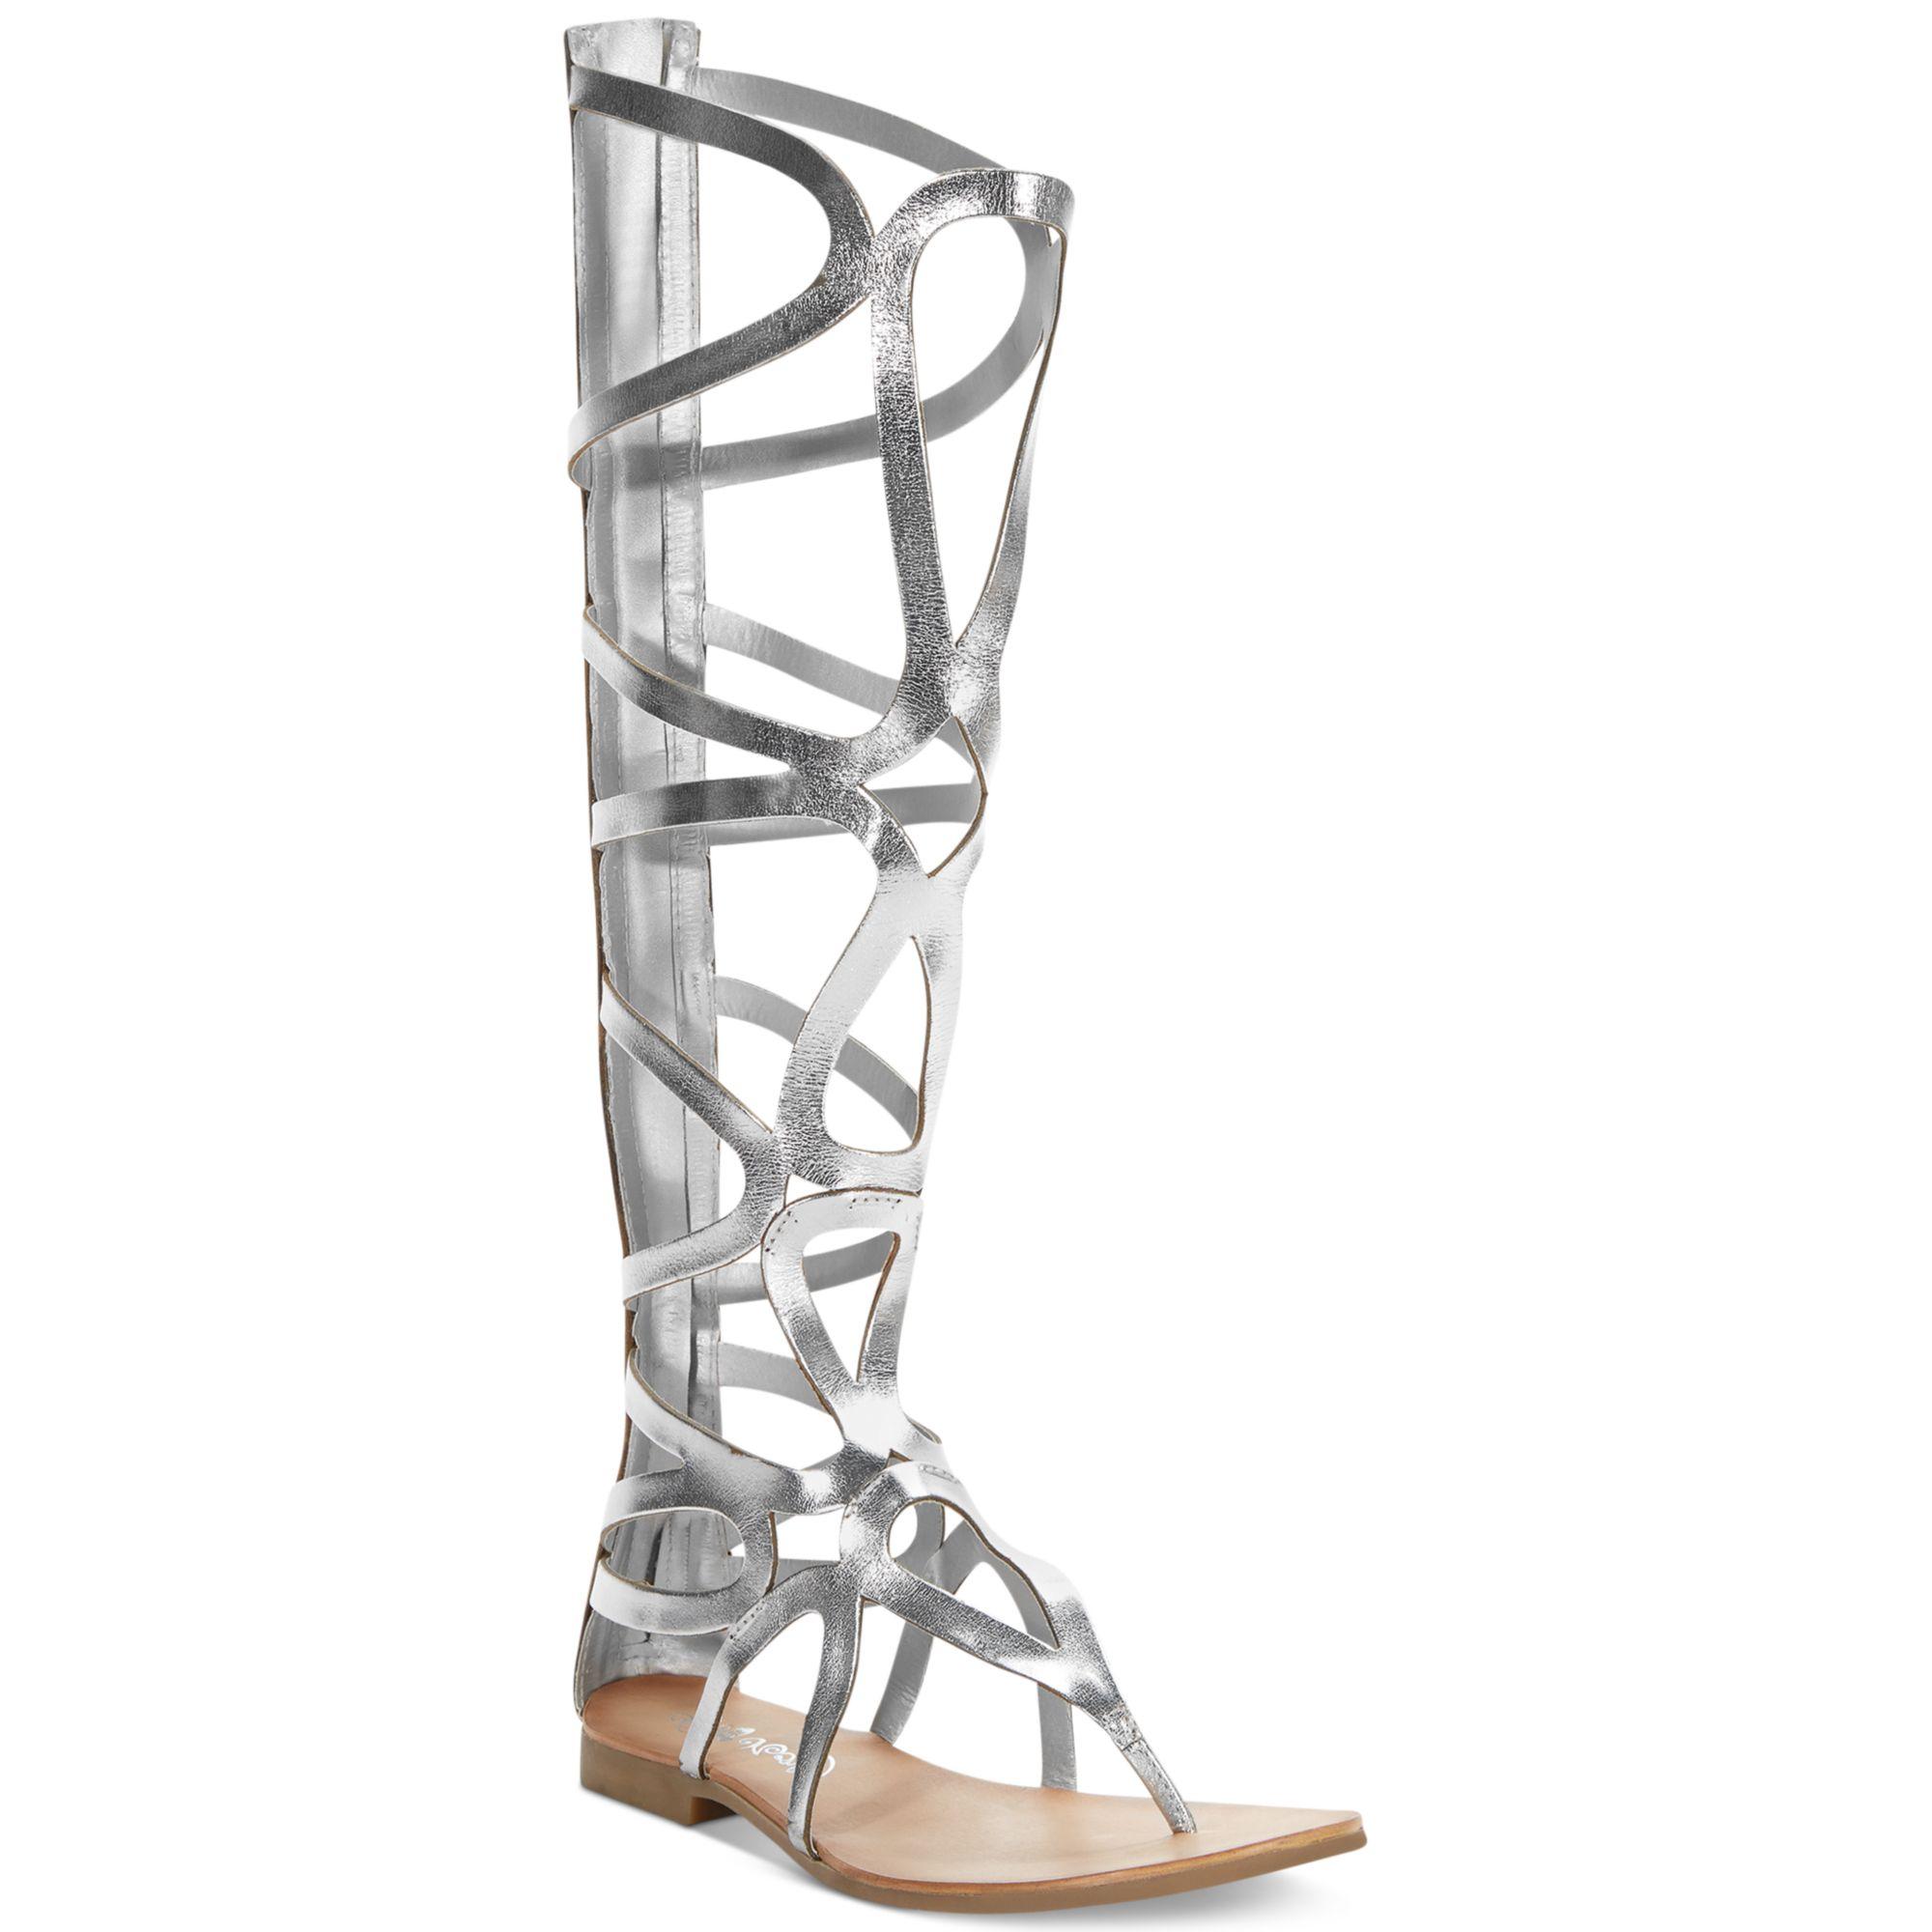 fdeeaaf526f Lyst - Naughty Monkey Spartacus Tall Shaft Gladiator Sandals in Metallic